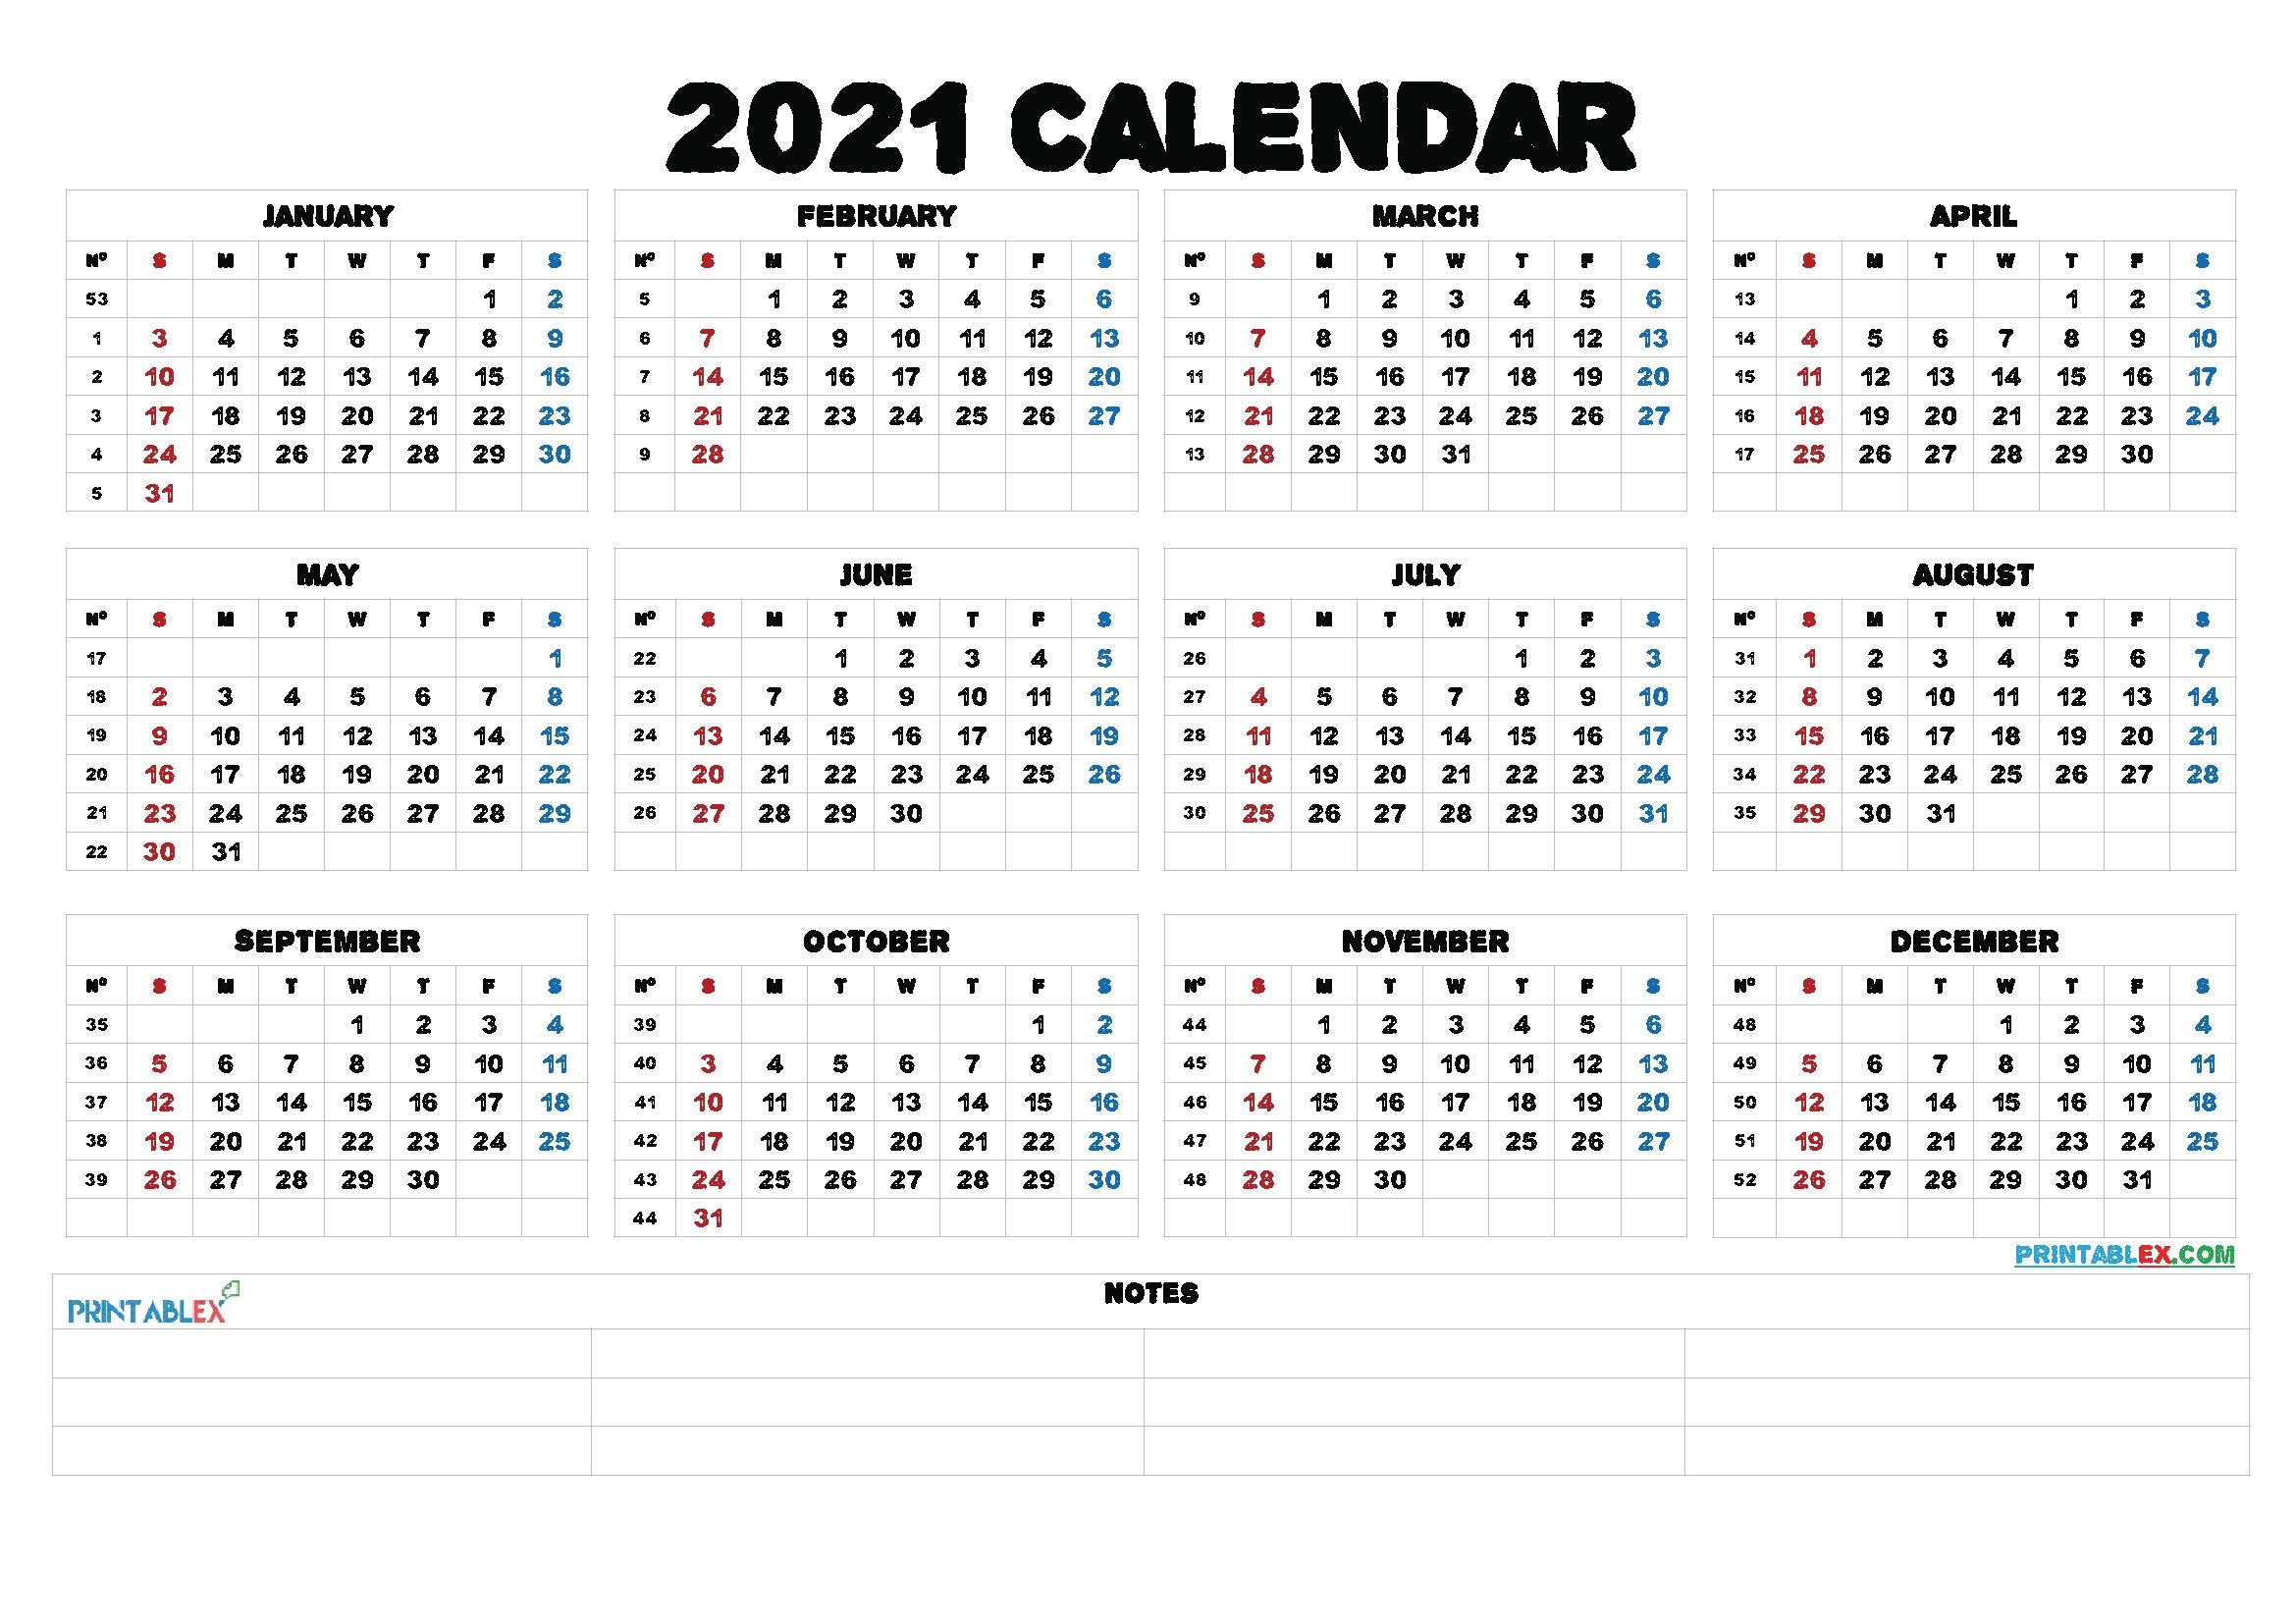 2021 Printable Yearly Calendar With Week Numbers - 21Ytw52 - Free Printable 2021 Monthly